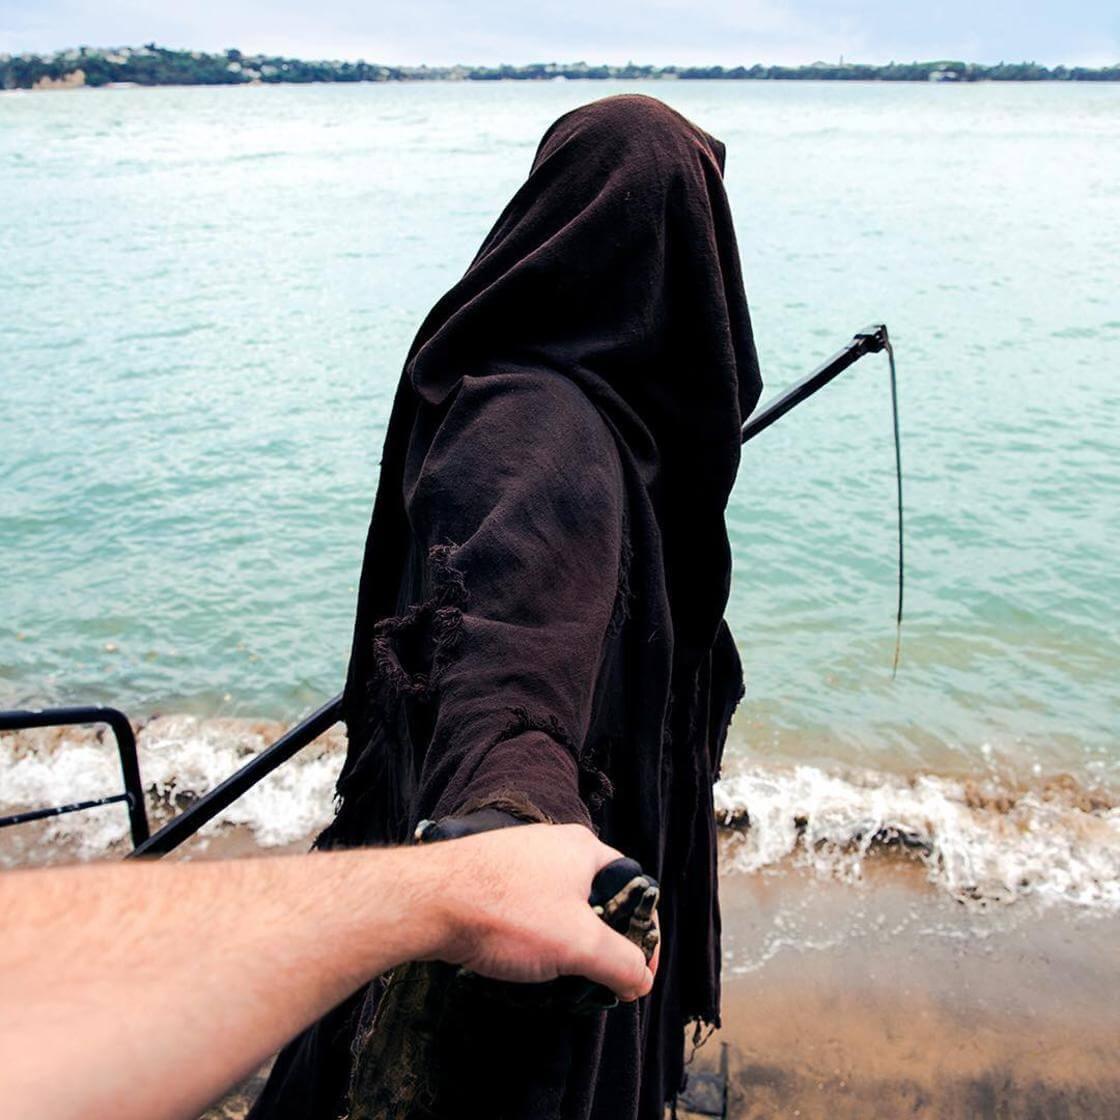 the swim reaper instagram 16 (1)